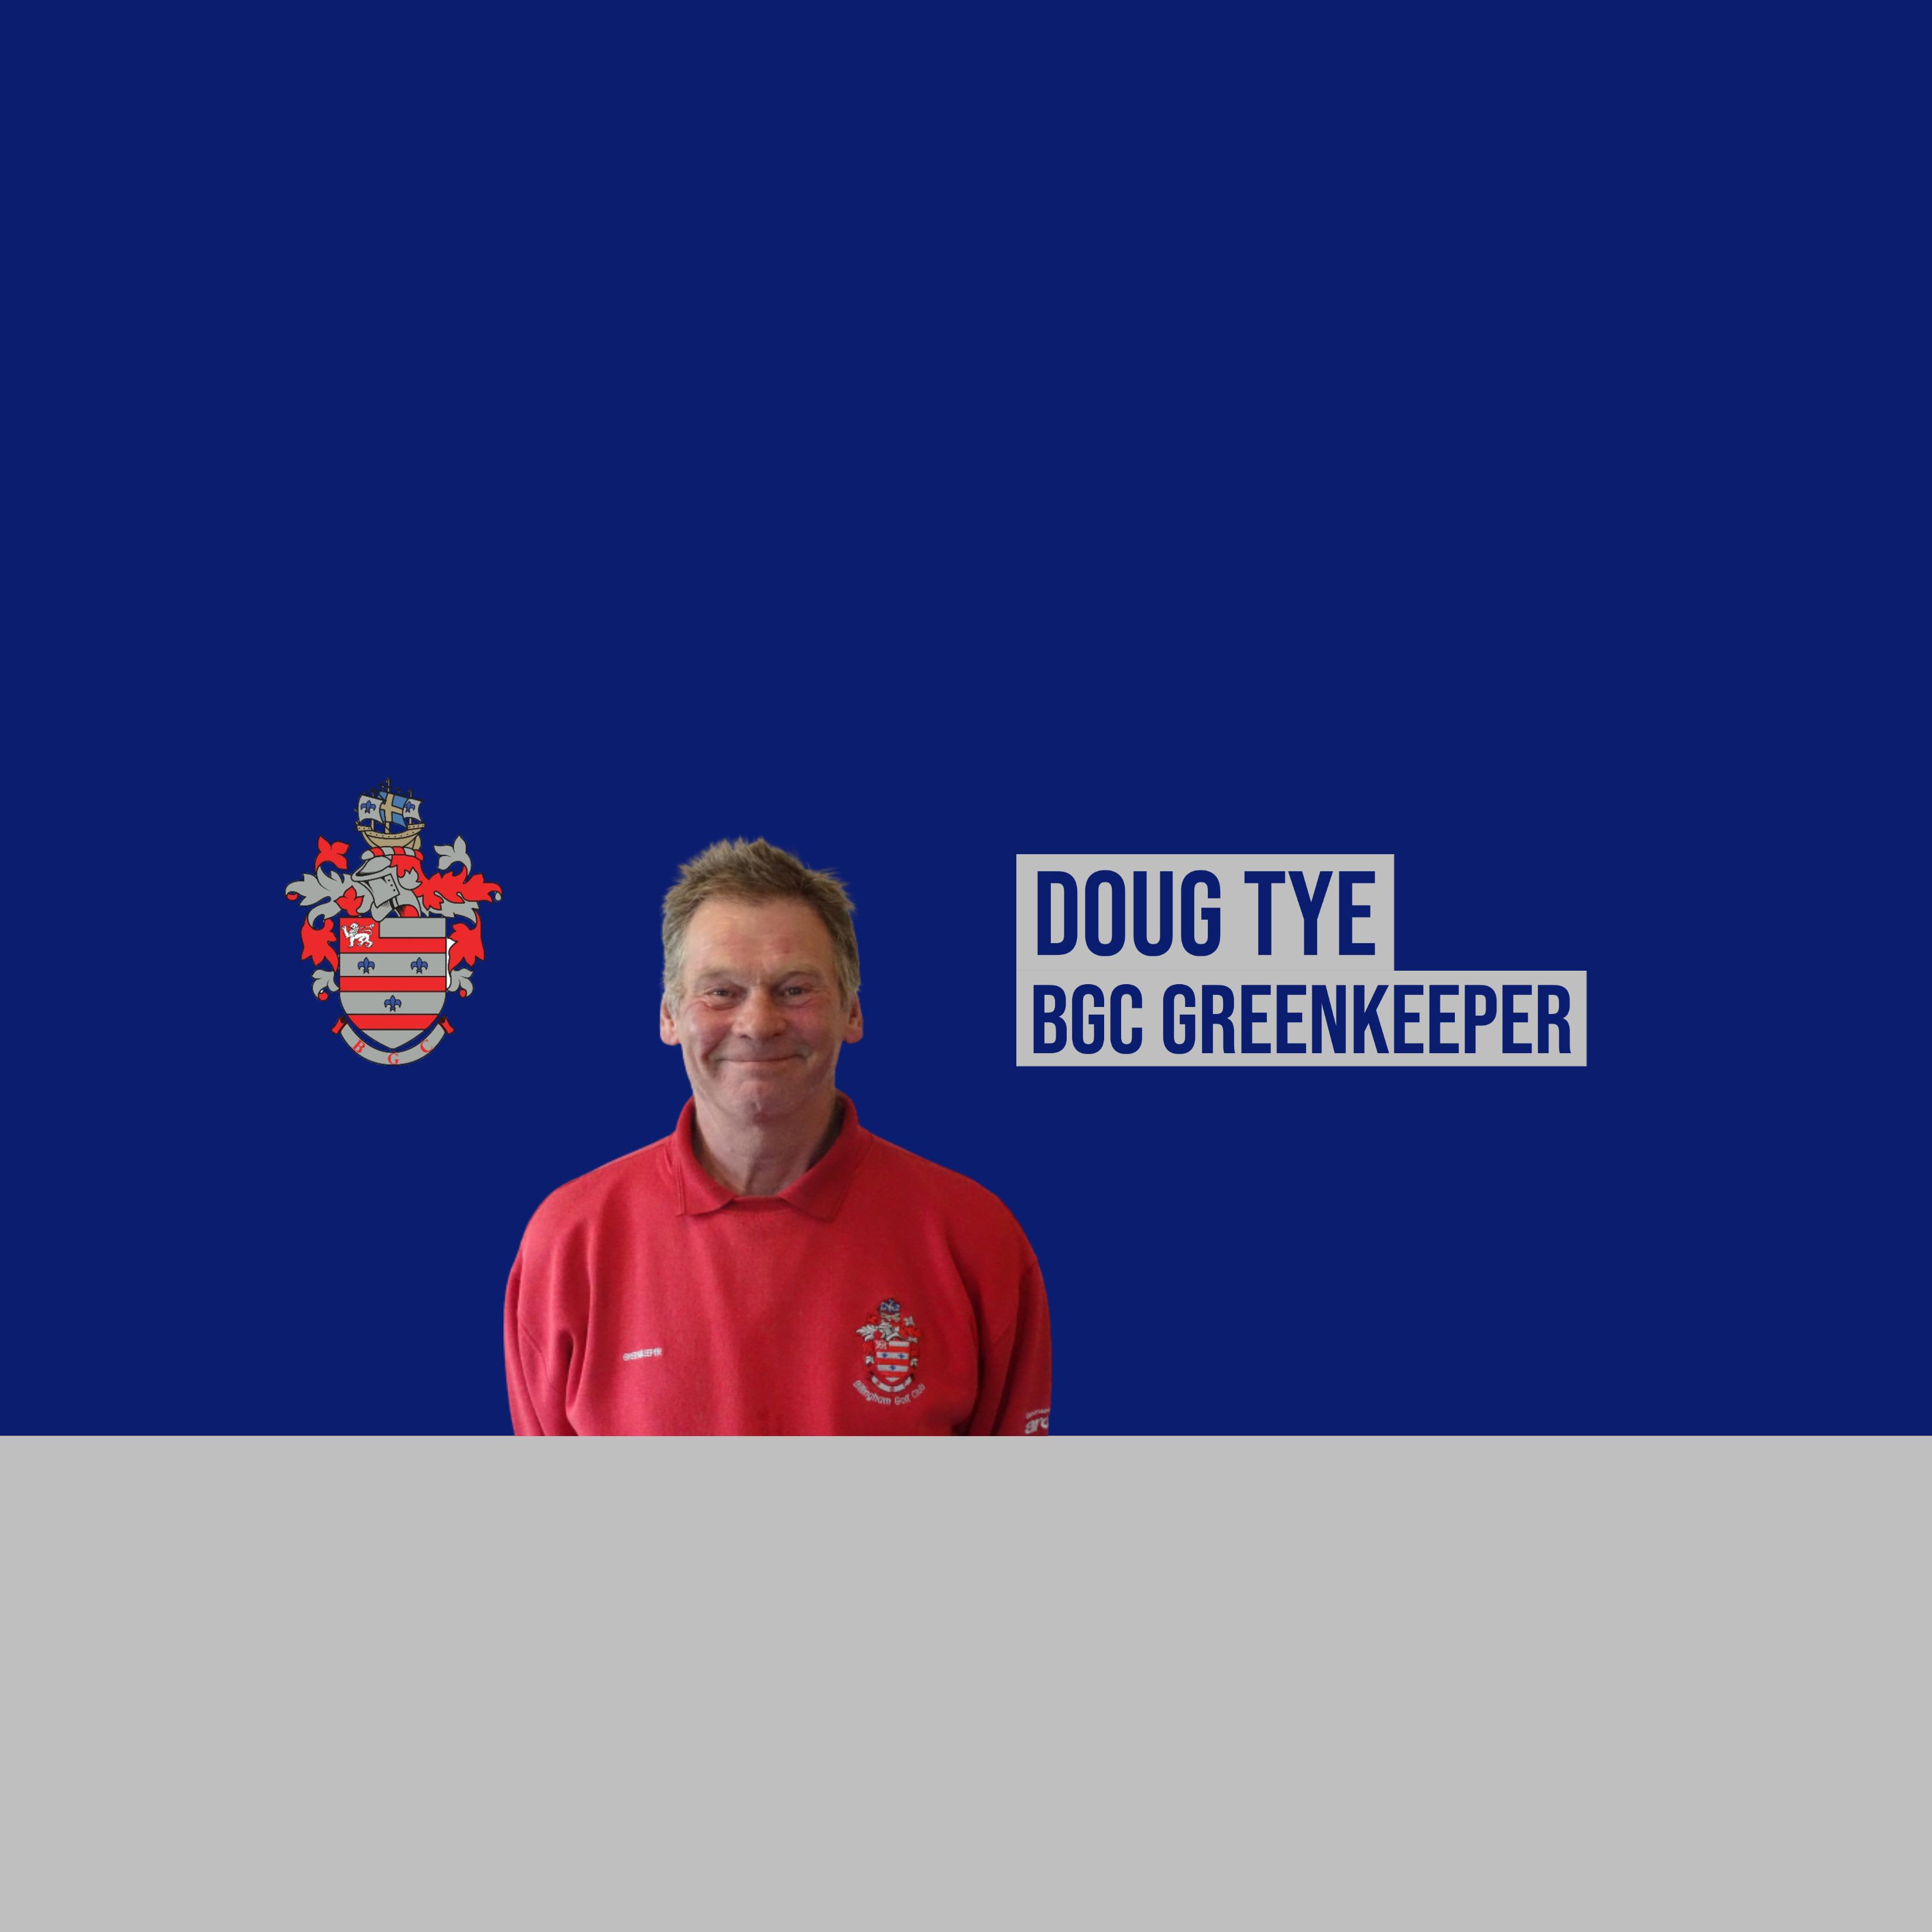 Doug Tye (BGC Greenkeeper)